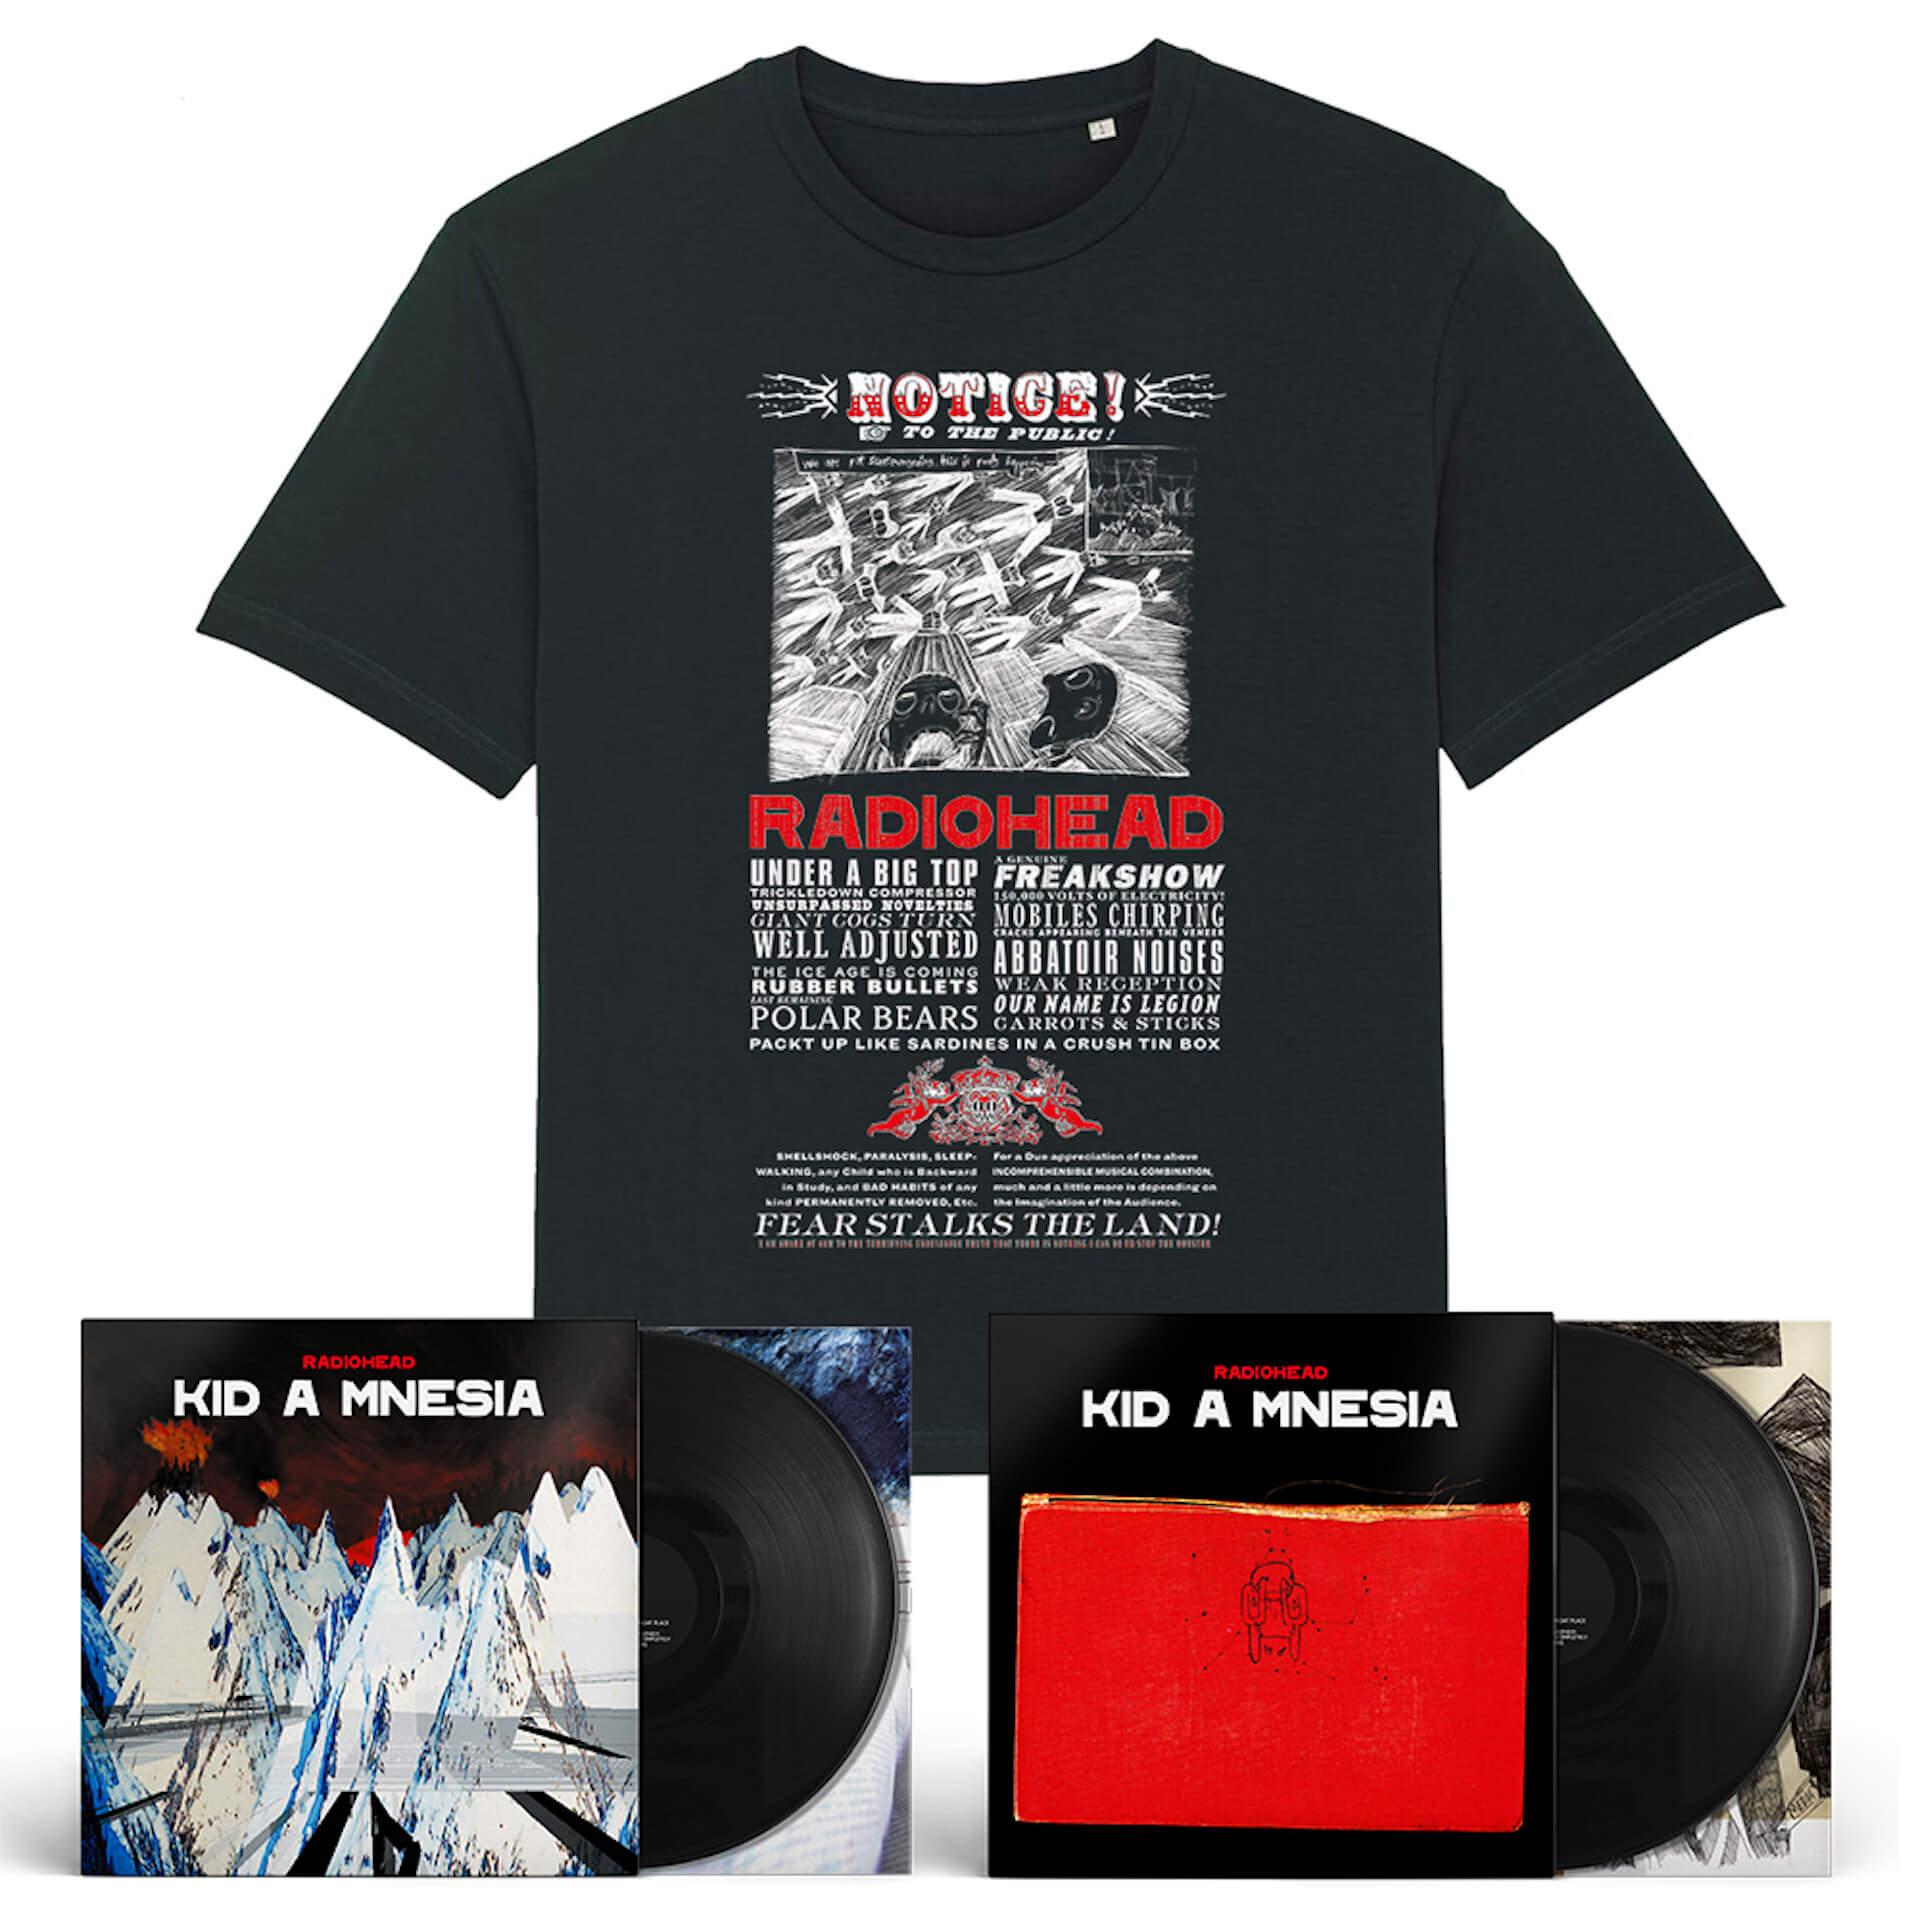 Radiohead『Kid A Mnesia』の日本限定バンドルが追加発売決定!最新オフィシャルTシャツも付属 music210915_radiohead_3